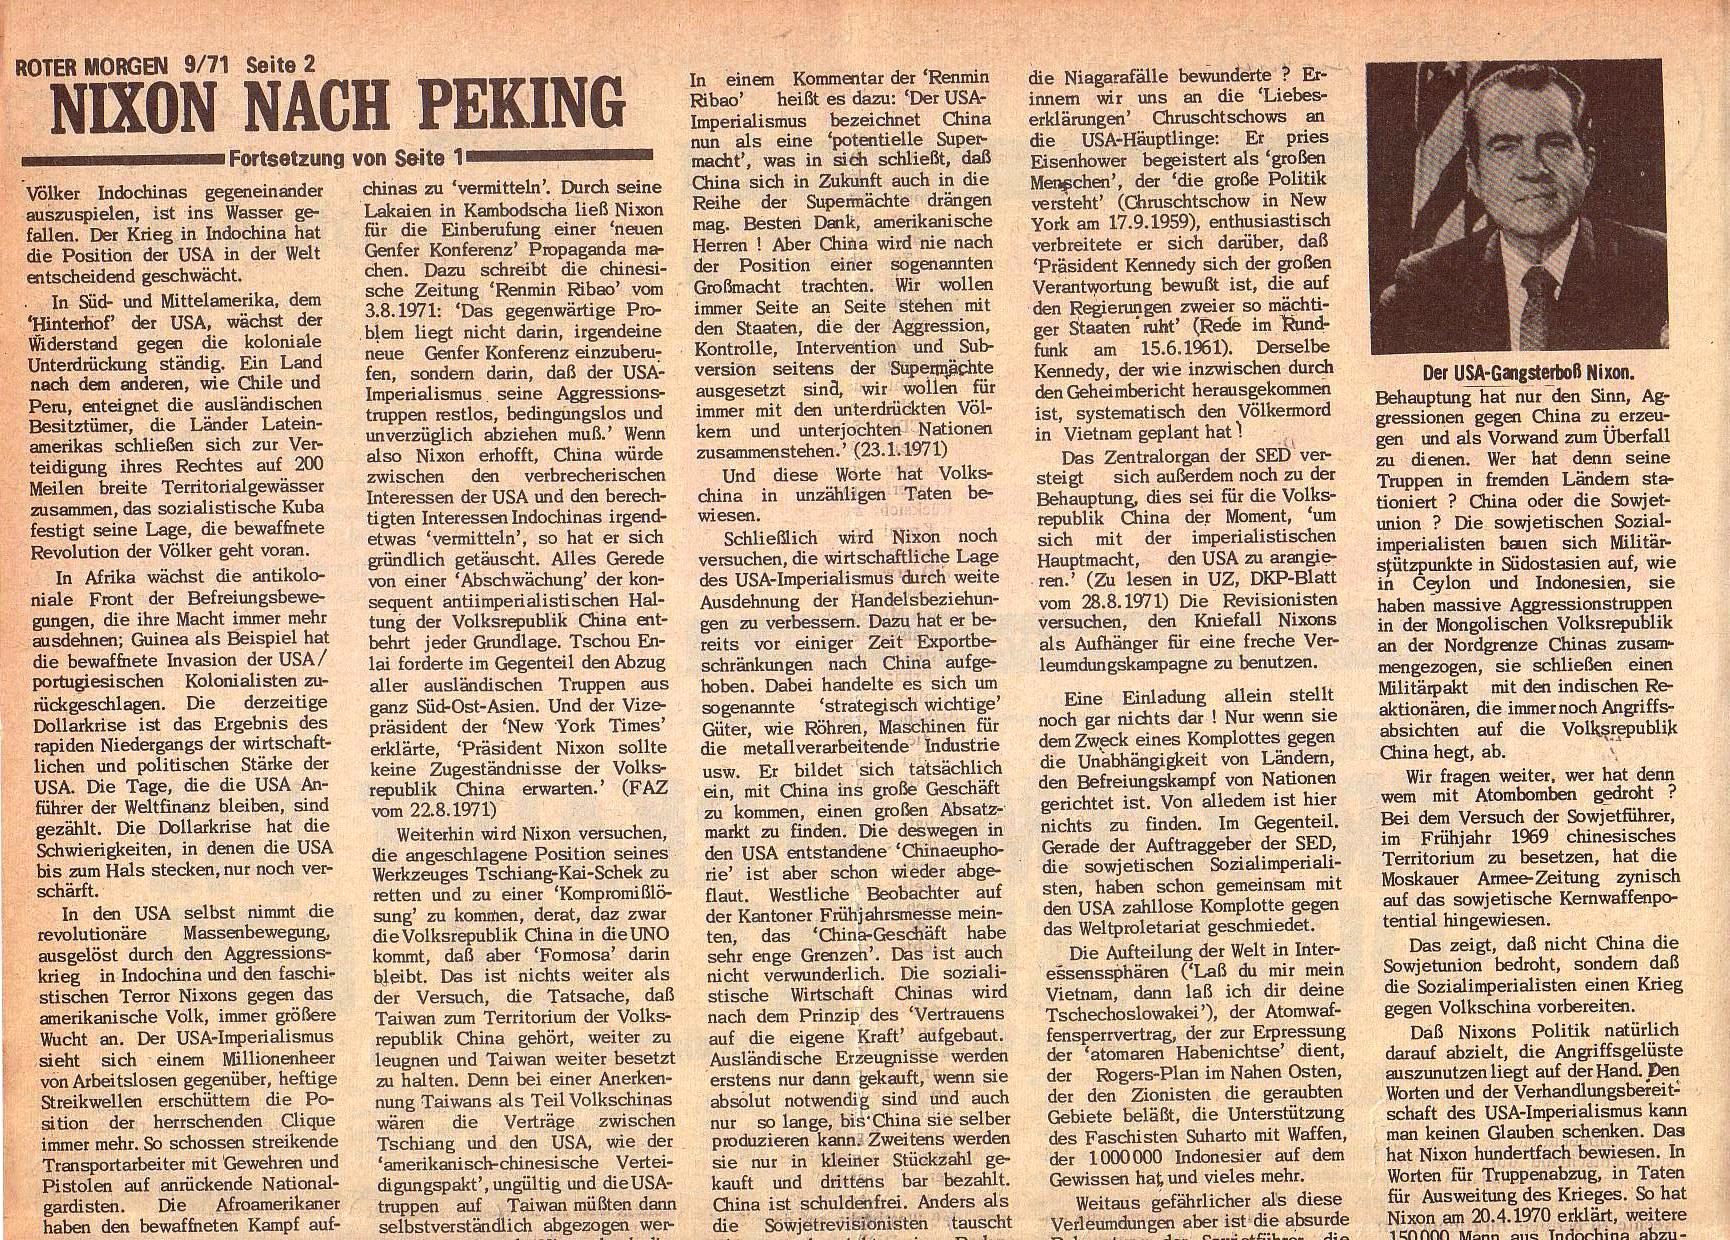 Roter Morgen, 5. Jg., 13. September 1971, Nr. 9, Seite 2a